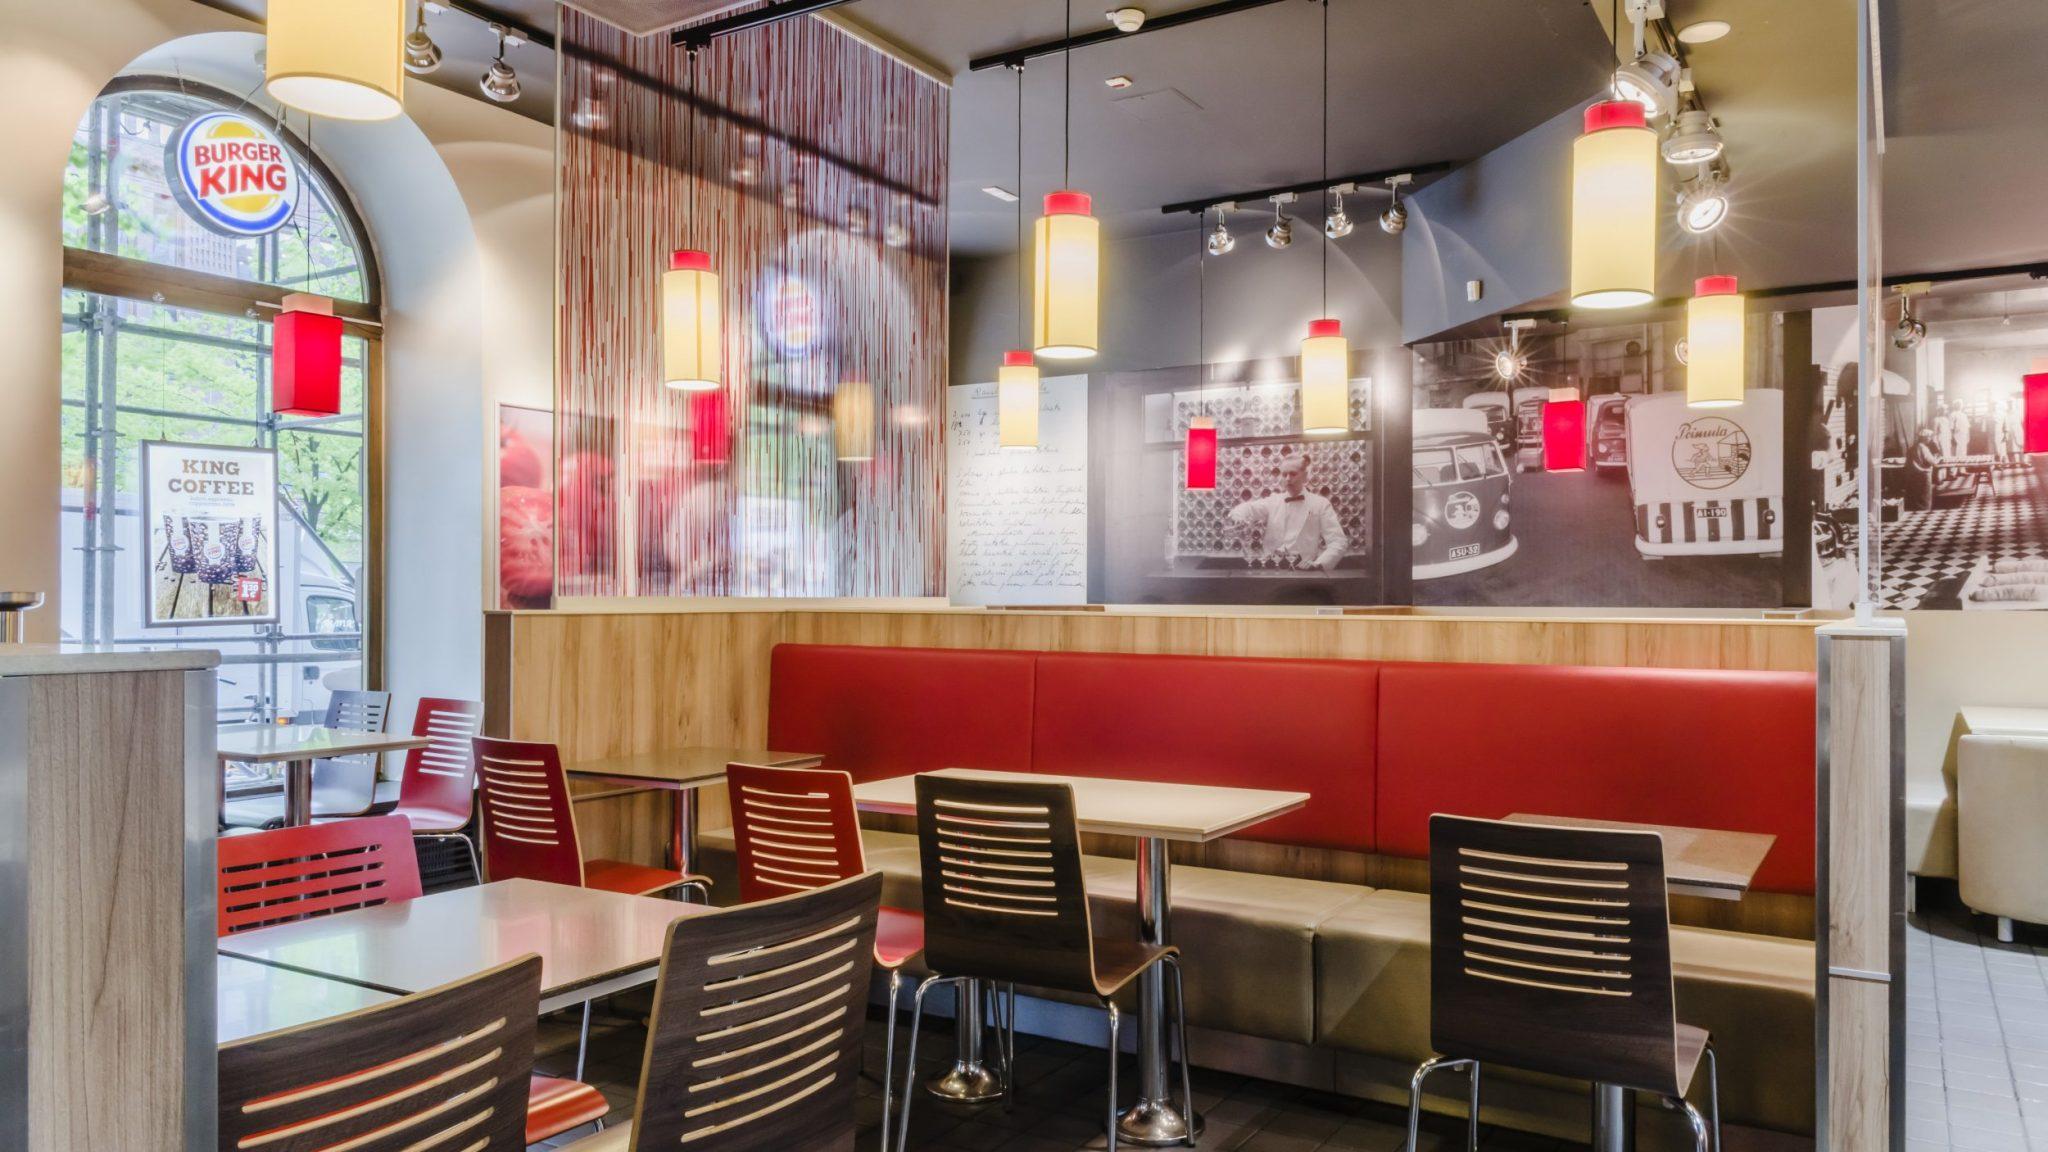 Burger-King-Mannerheimintie-Helsinki-GI-Project-1